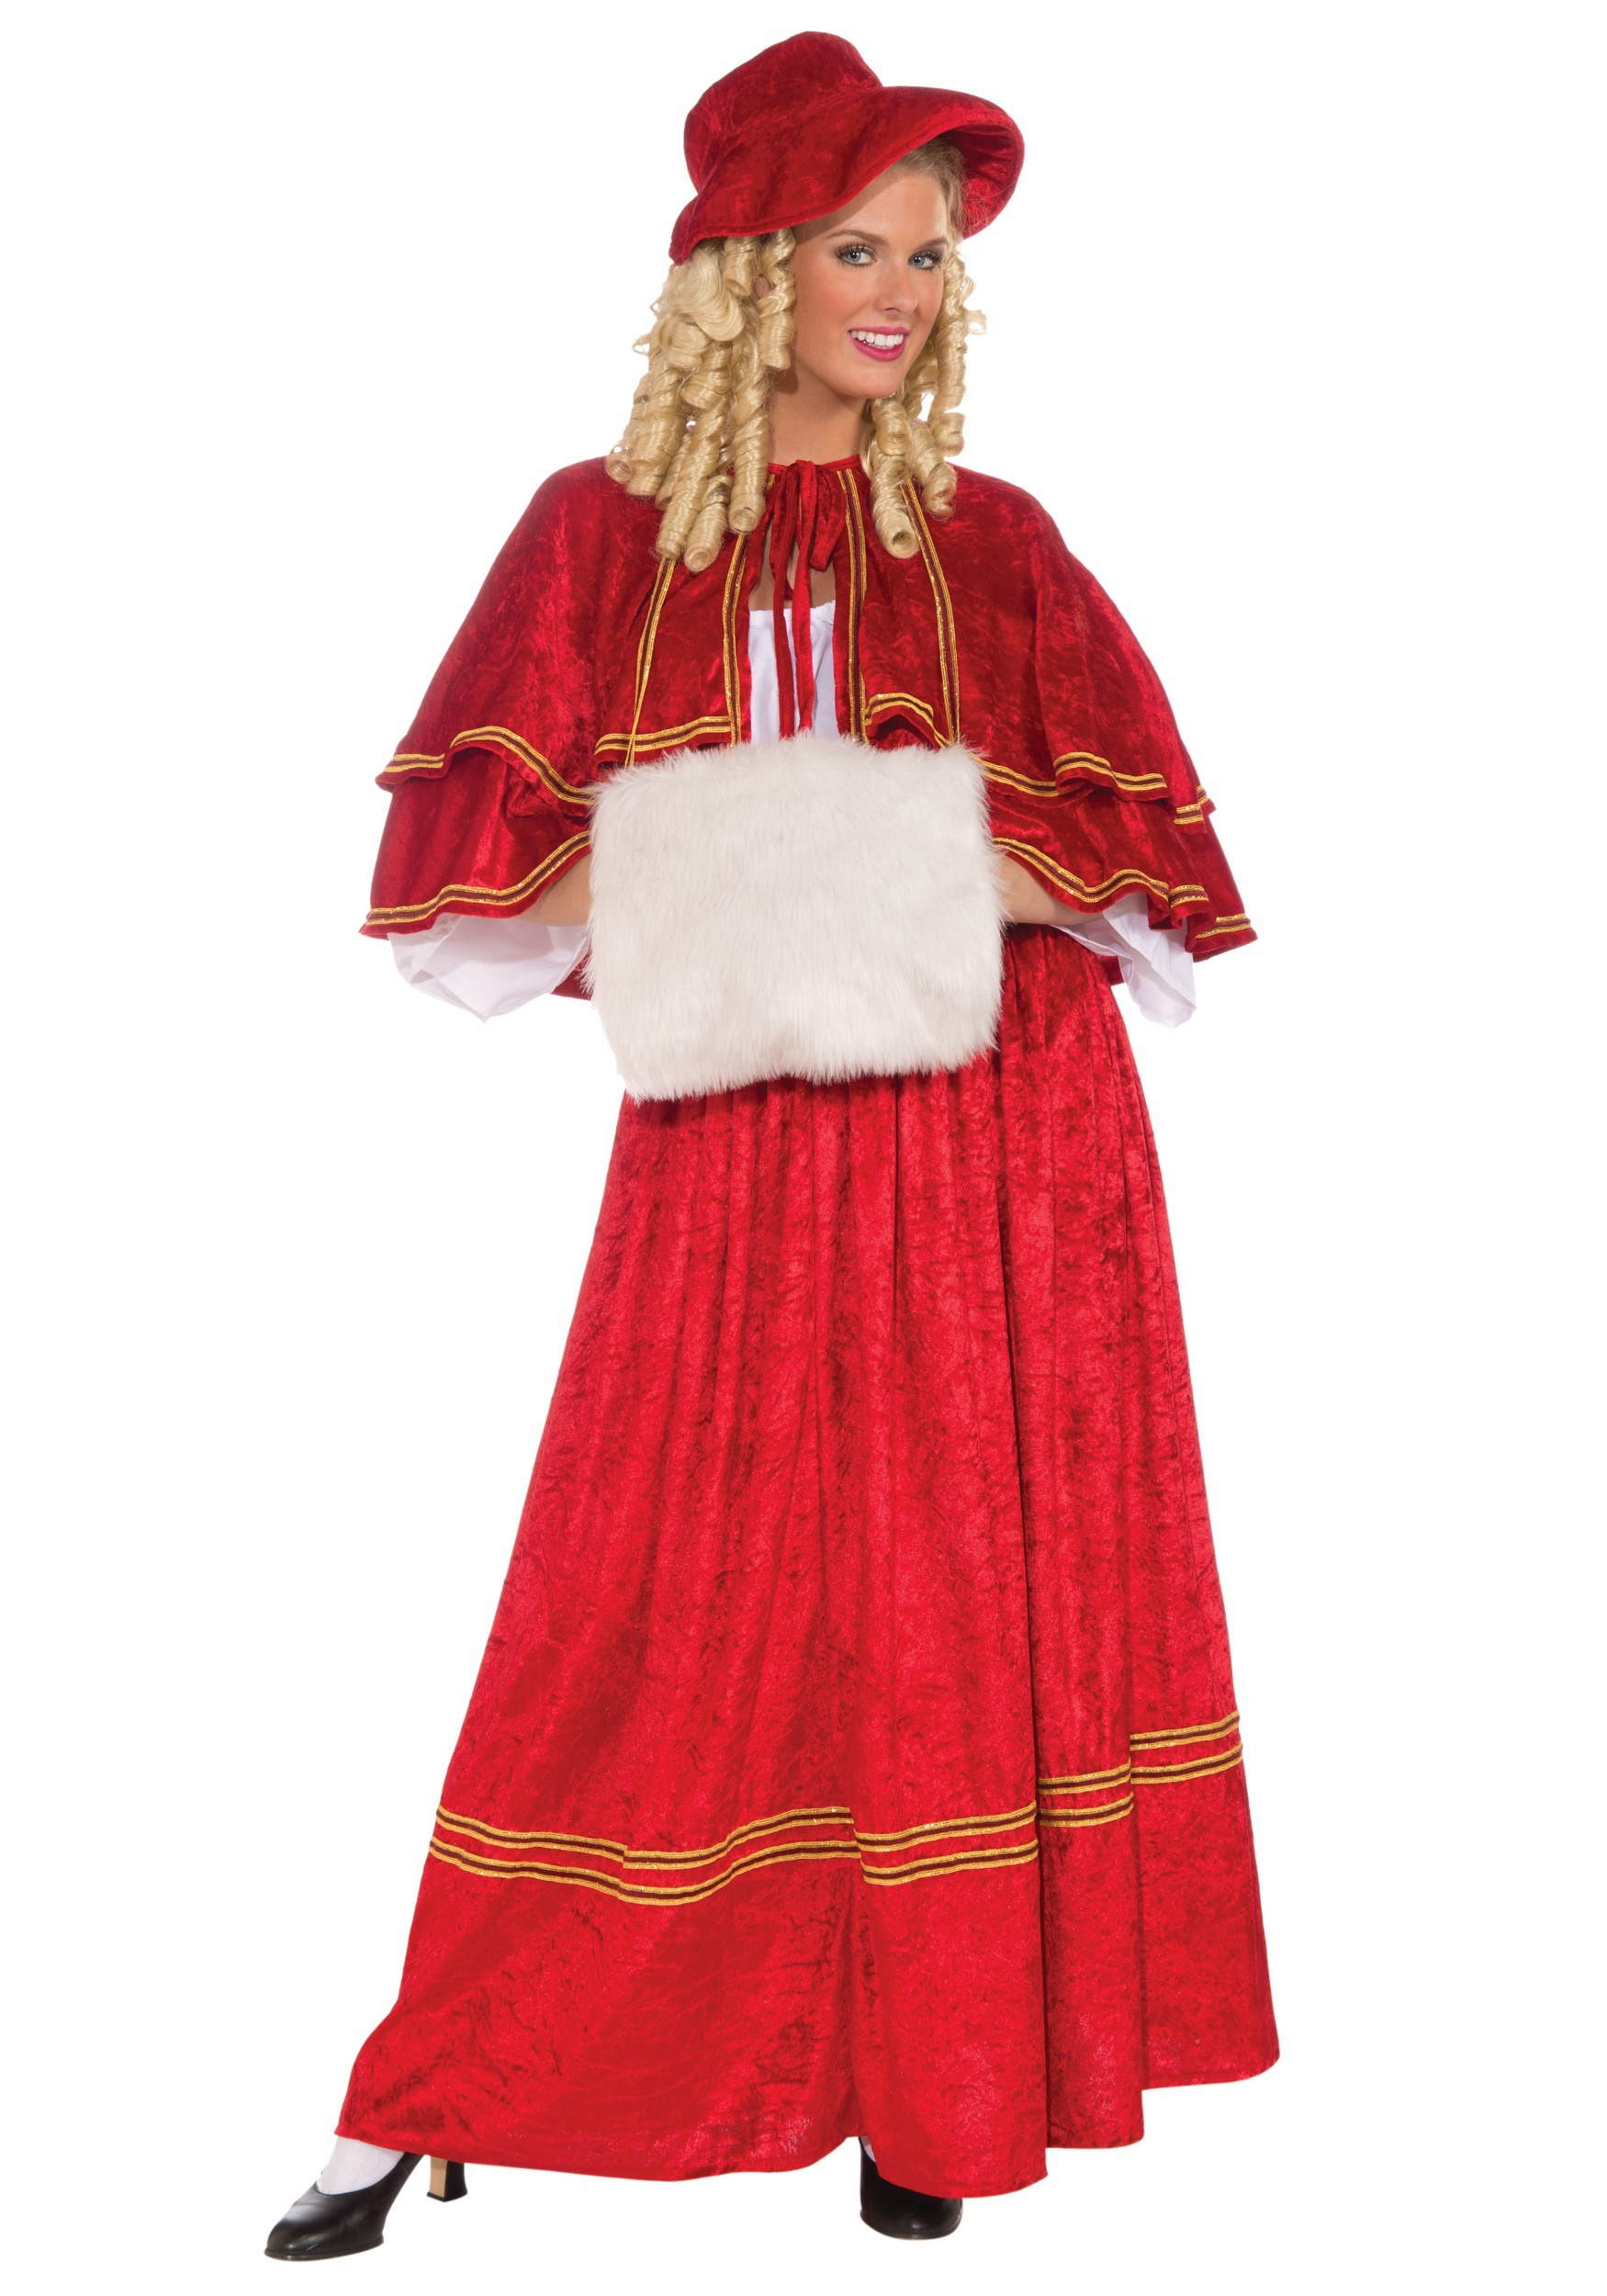 Christmas Caroling Costume.Christmas Caroler Costume